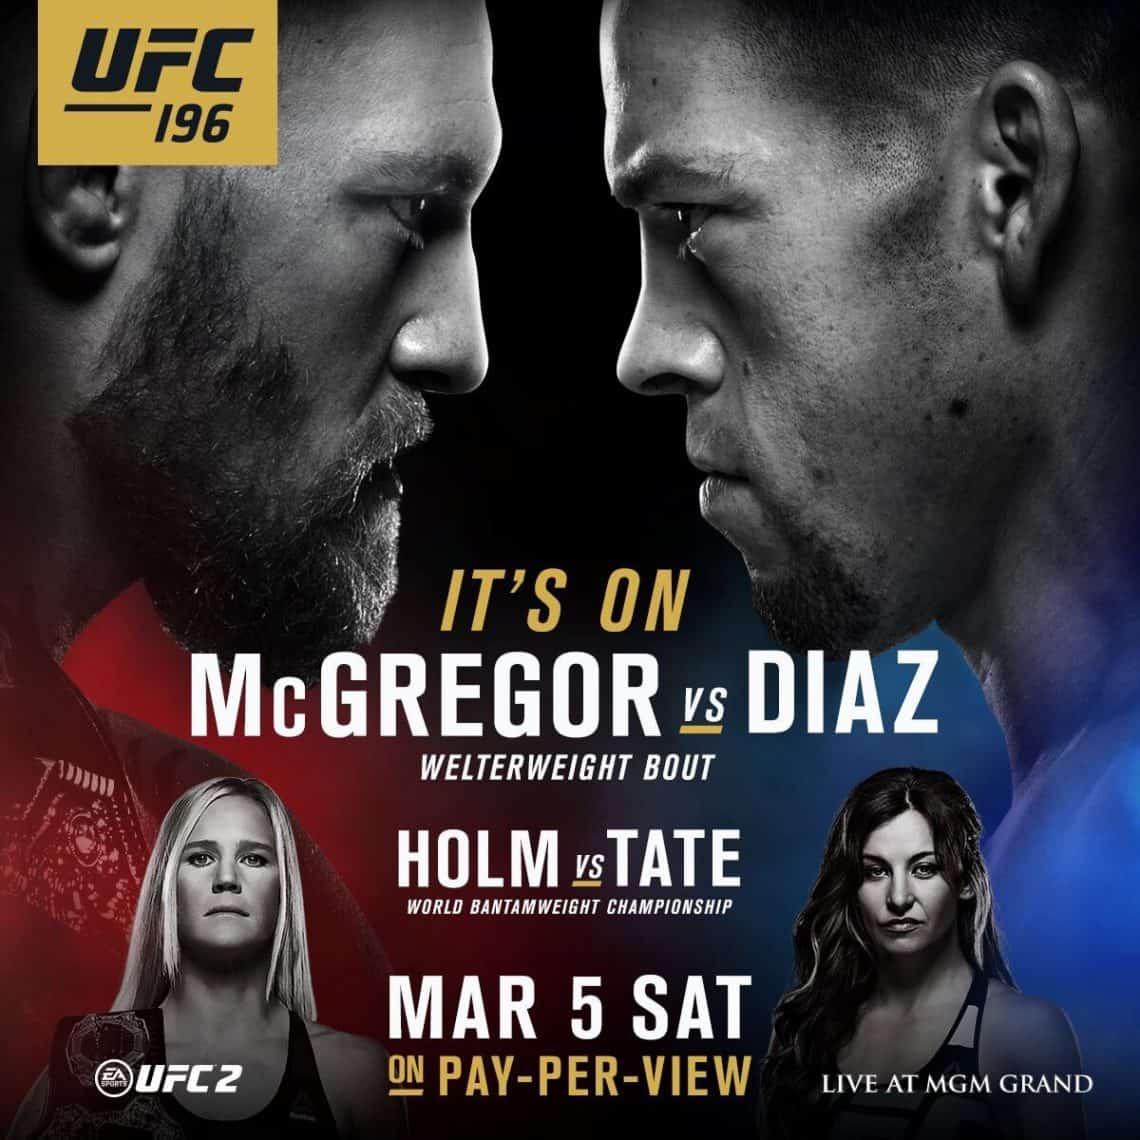 UFC 196: McGregor vs. Diaz 1